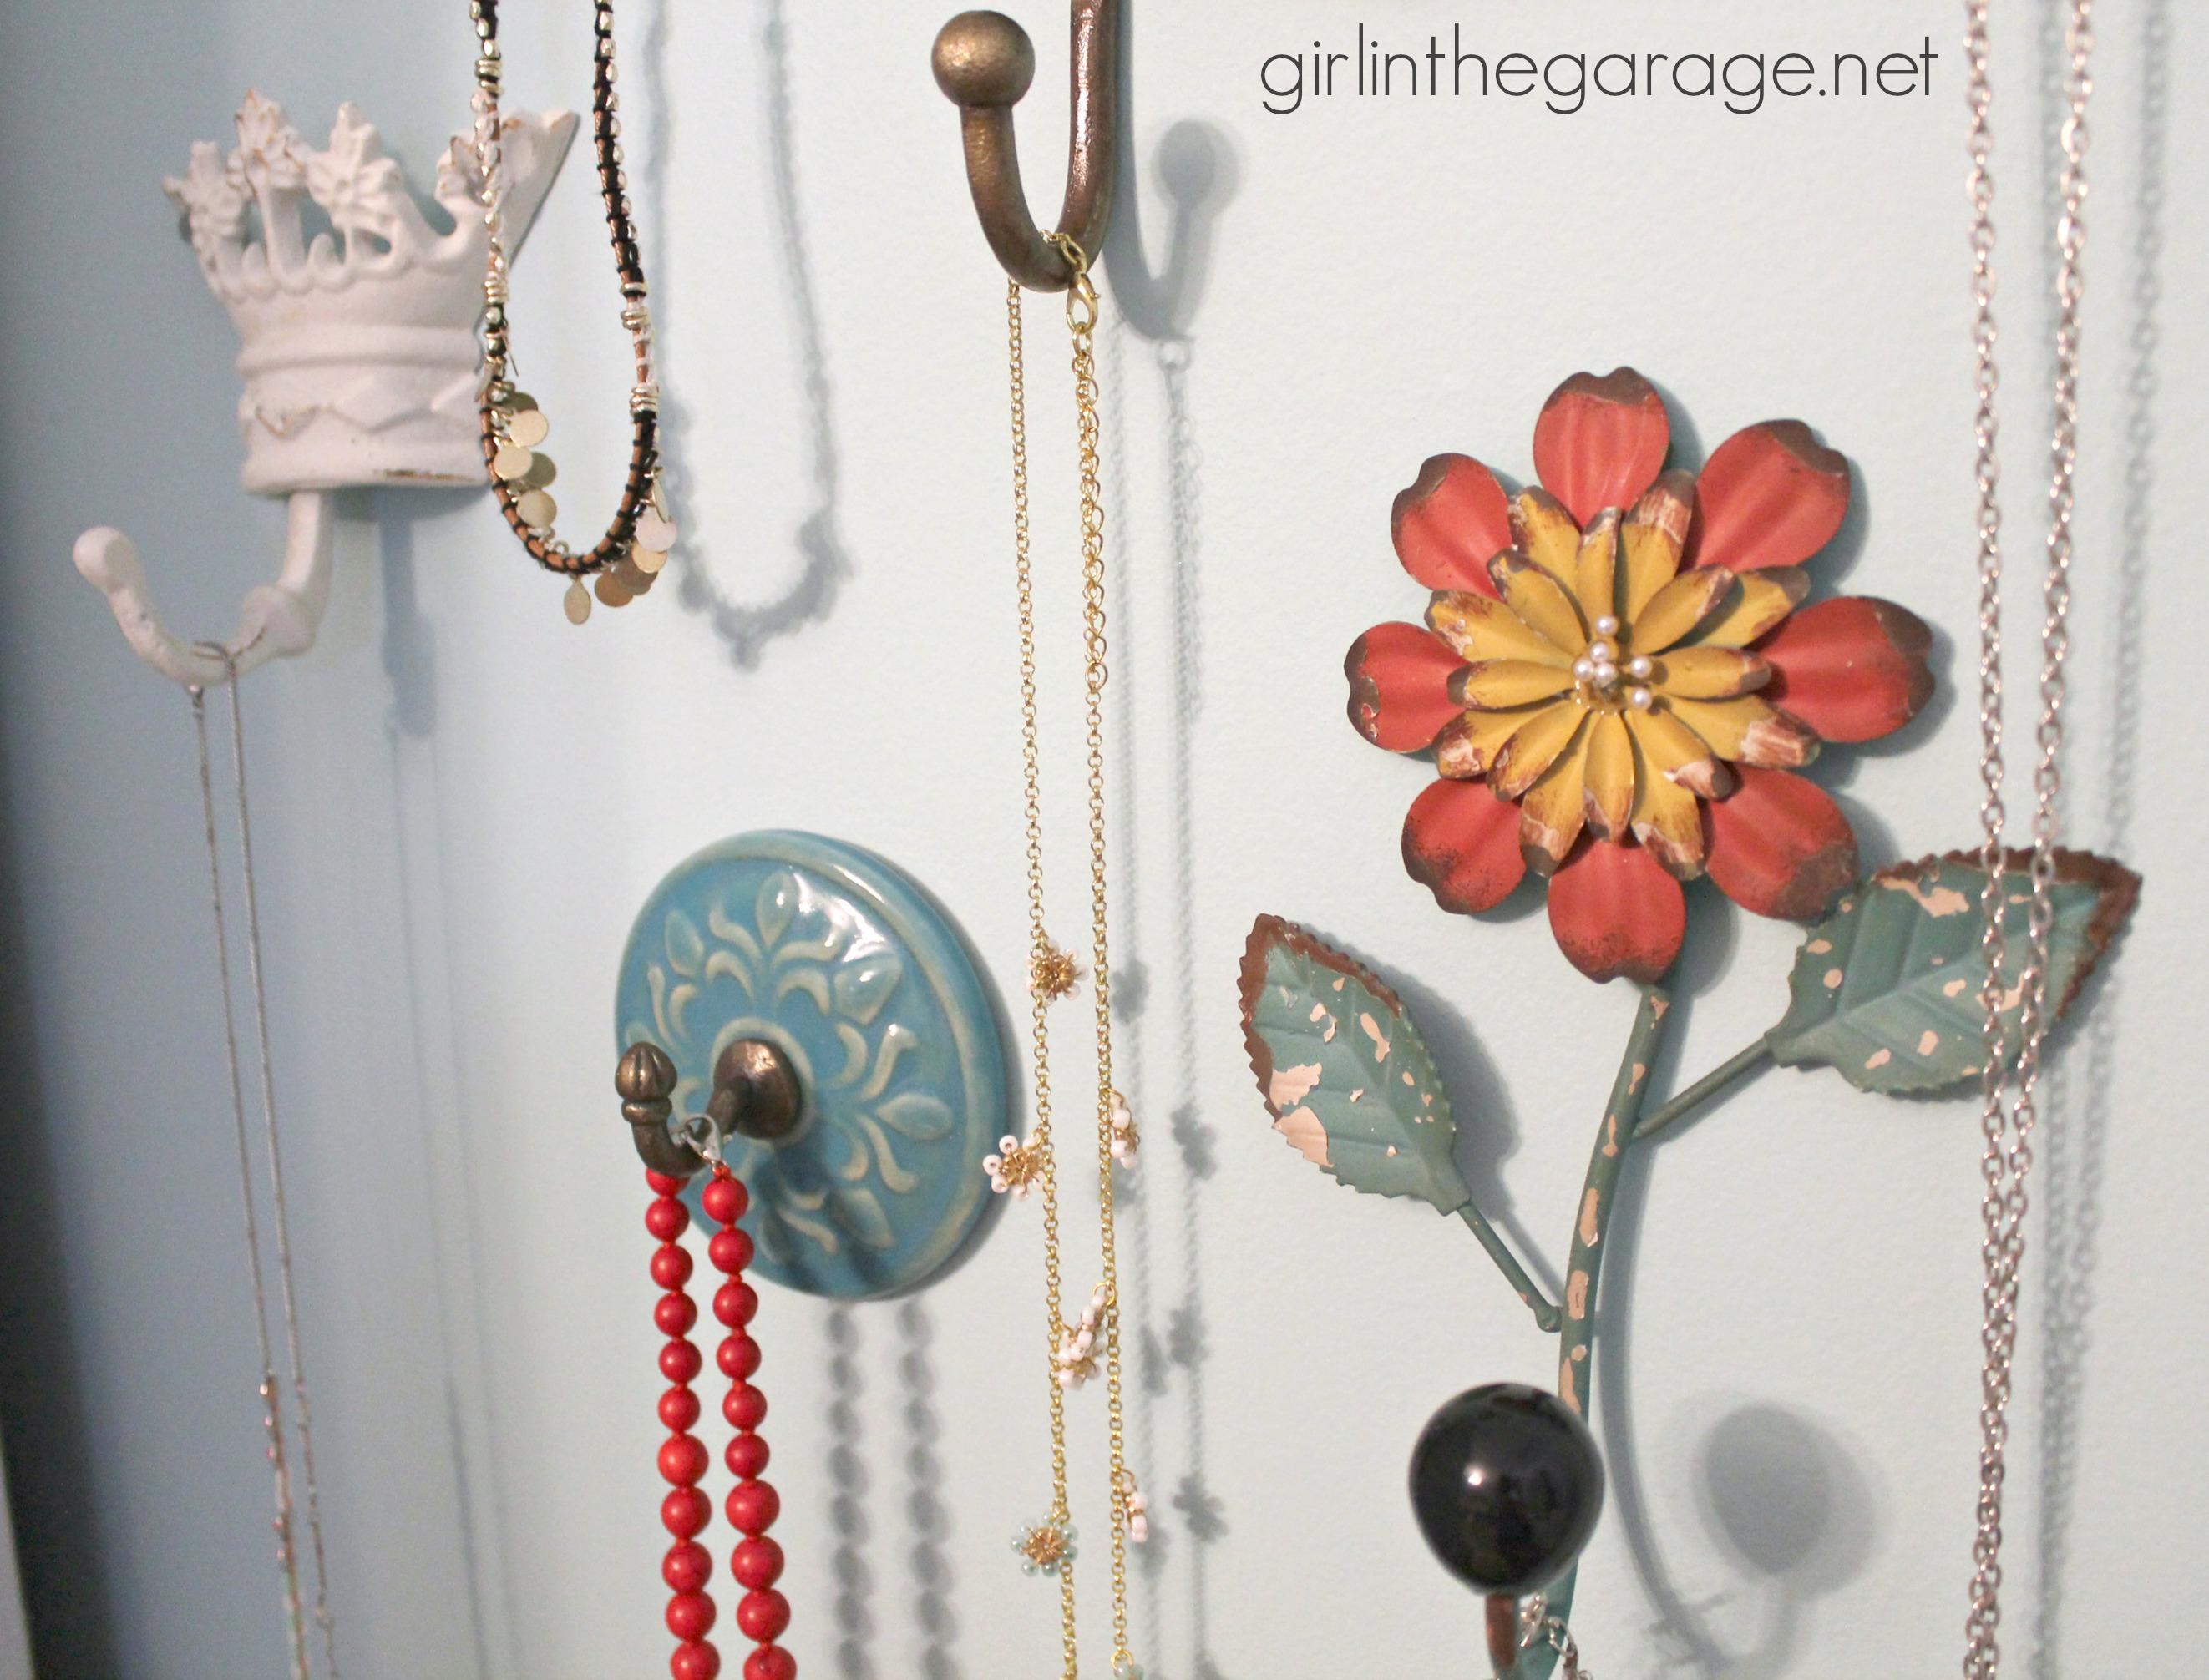 facial of or best ideas flat decorative decor joist hangers picture brackets